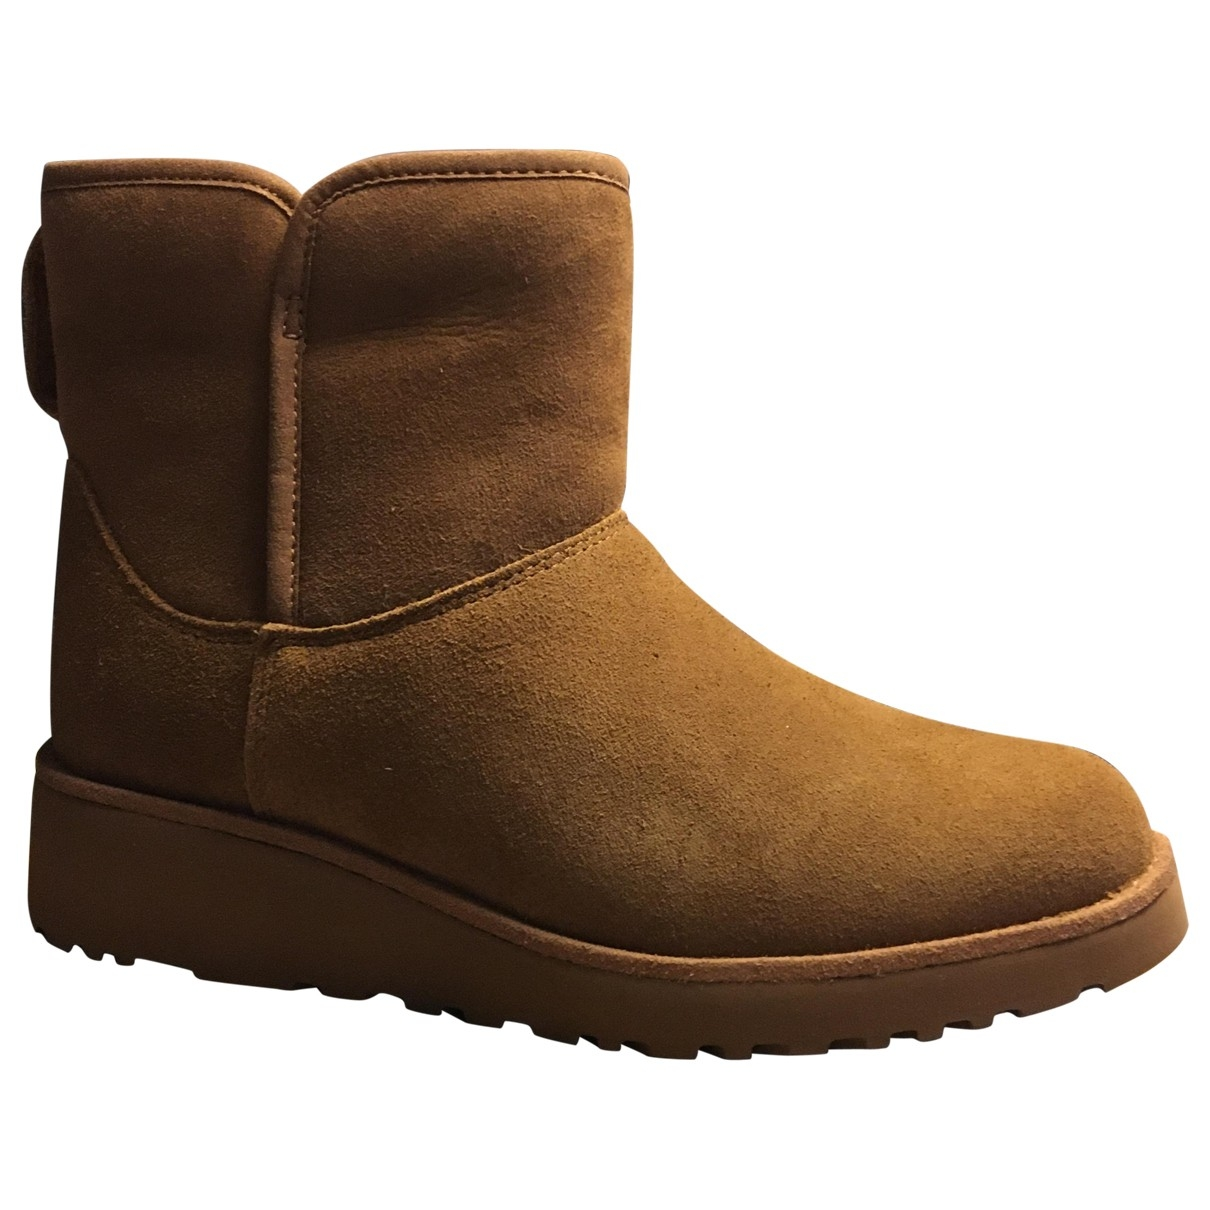 Ugg - Boots   pour femme en suede - camel